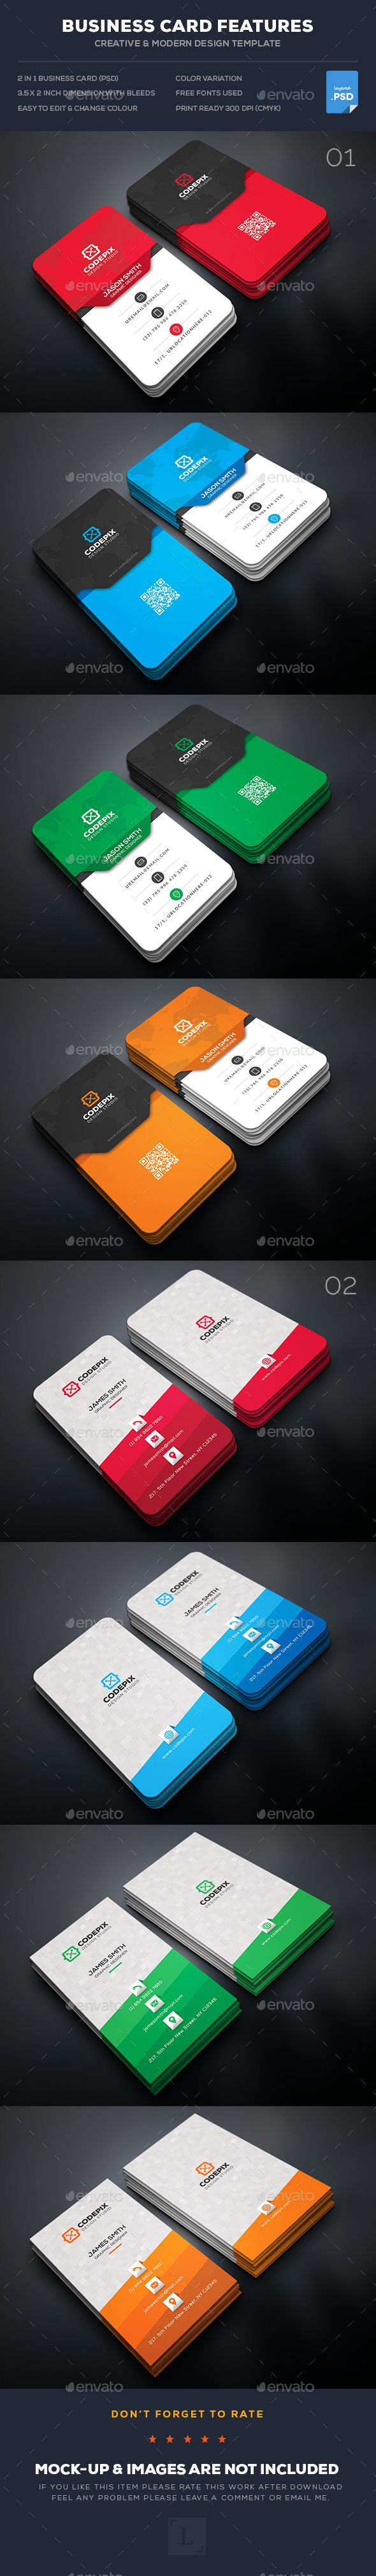 Business Card Templates PSD Bundle. Download here: https://graphicriver.net/item/business-card-bundle/17437279?ref=ksioks